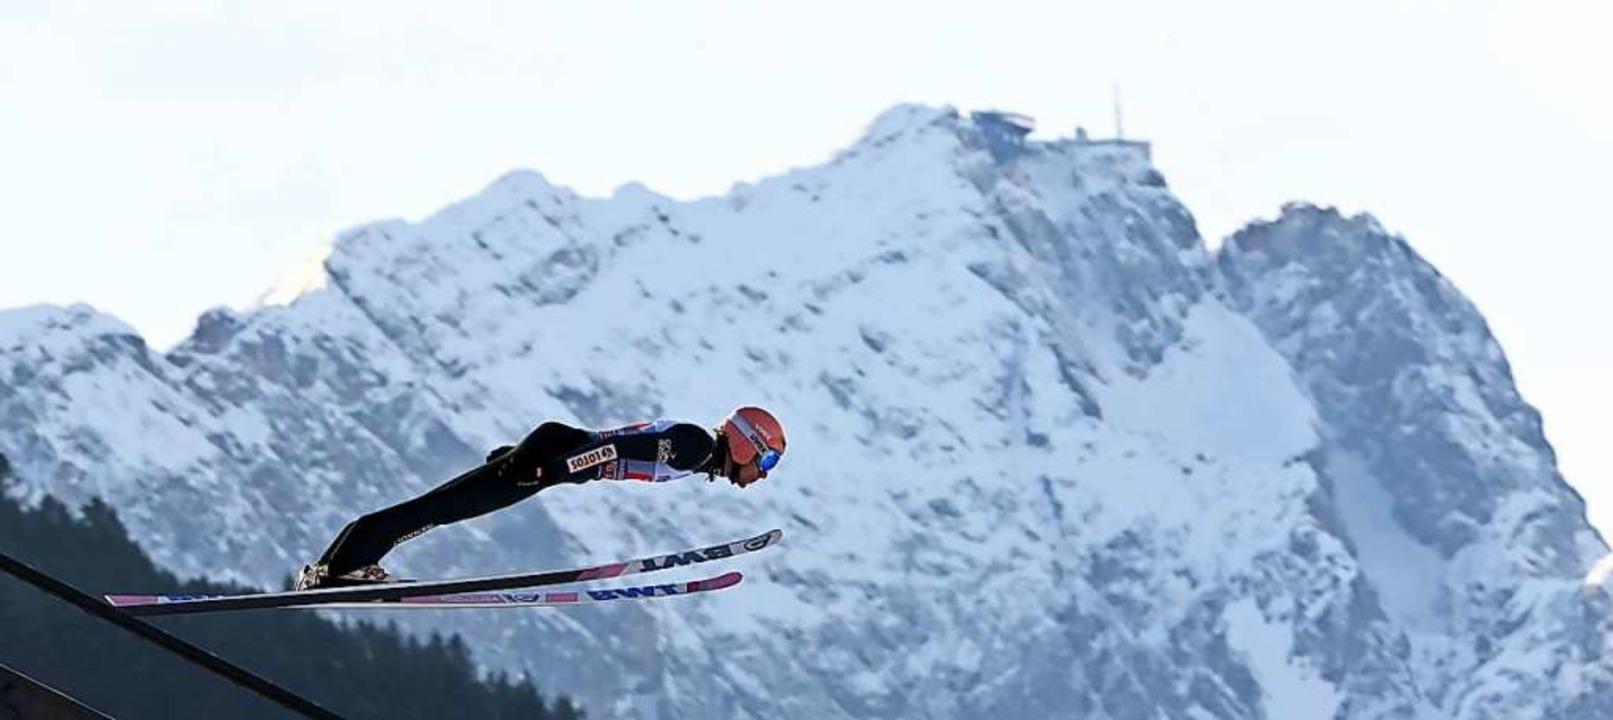 Dawid Kubacki, der Sieger des Springens am Neujahrstag  | Foto: CHRISTOF STACHE (AFP)